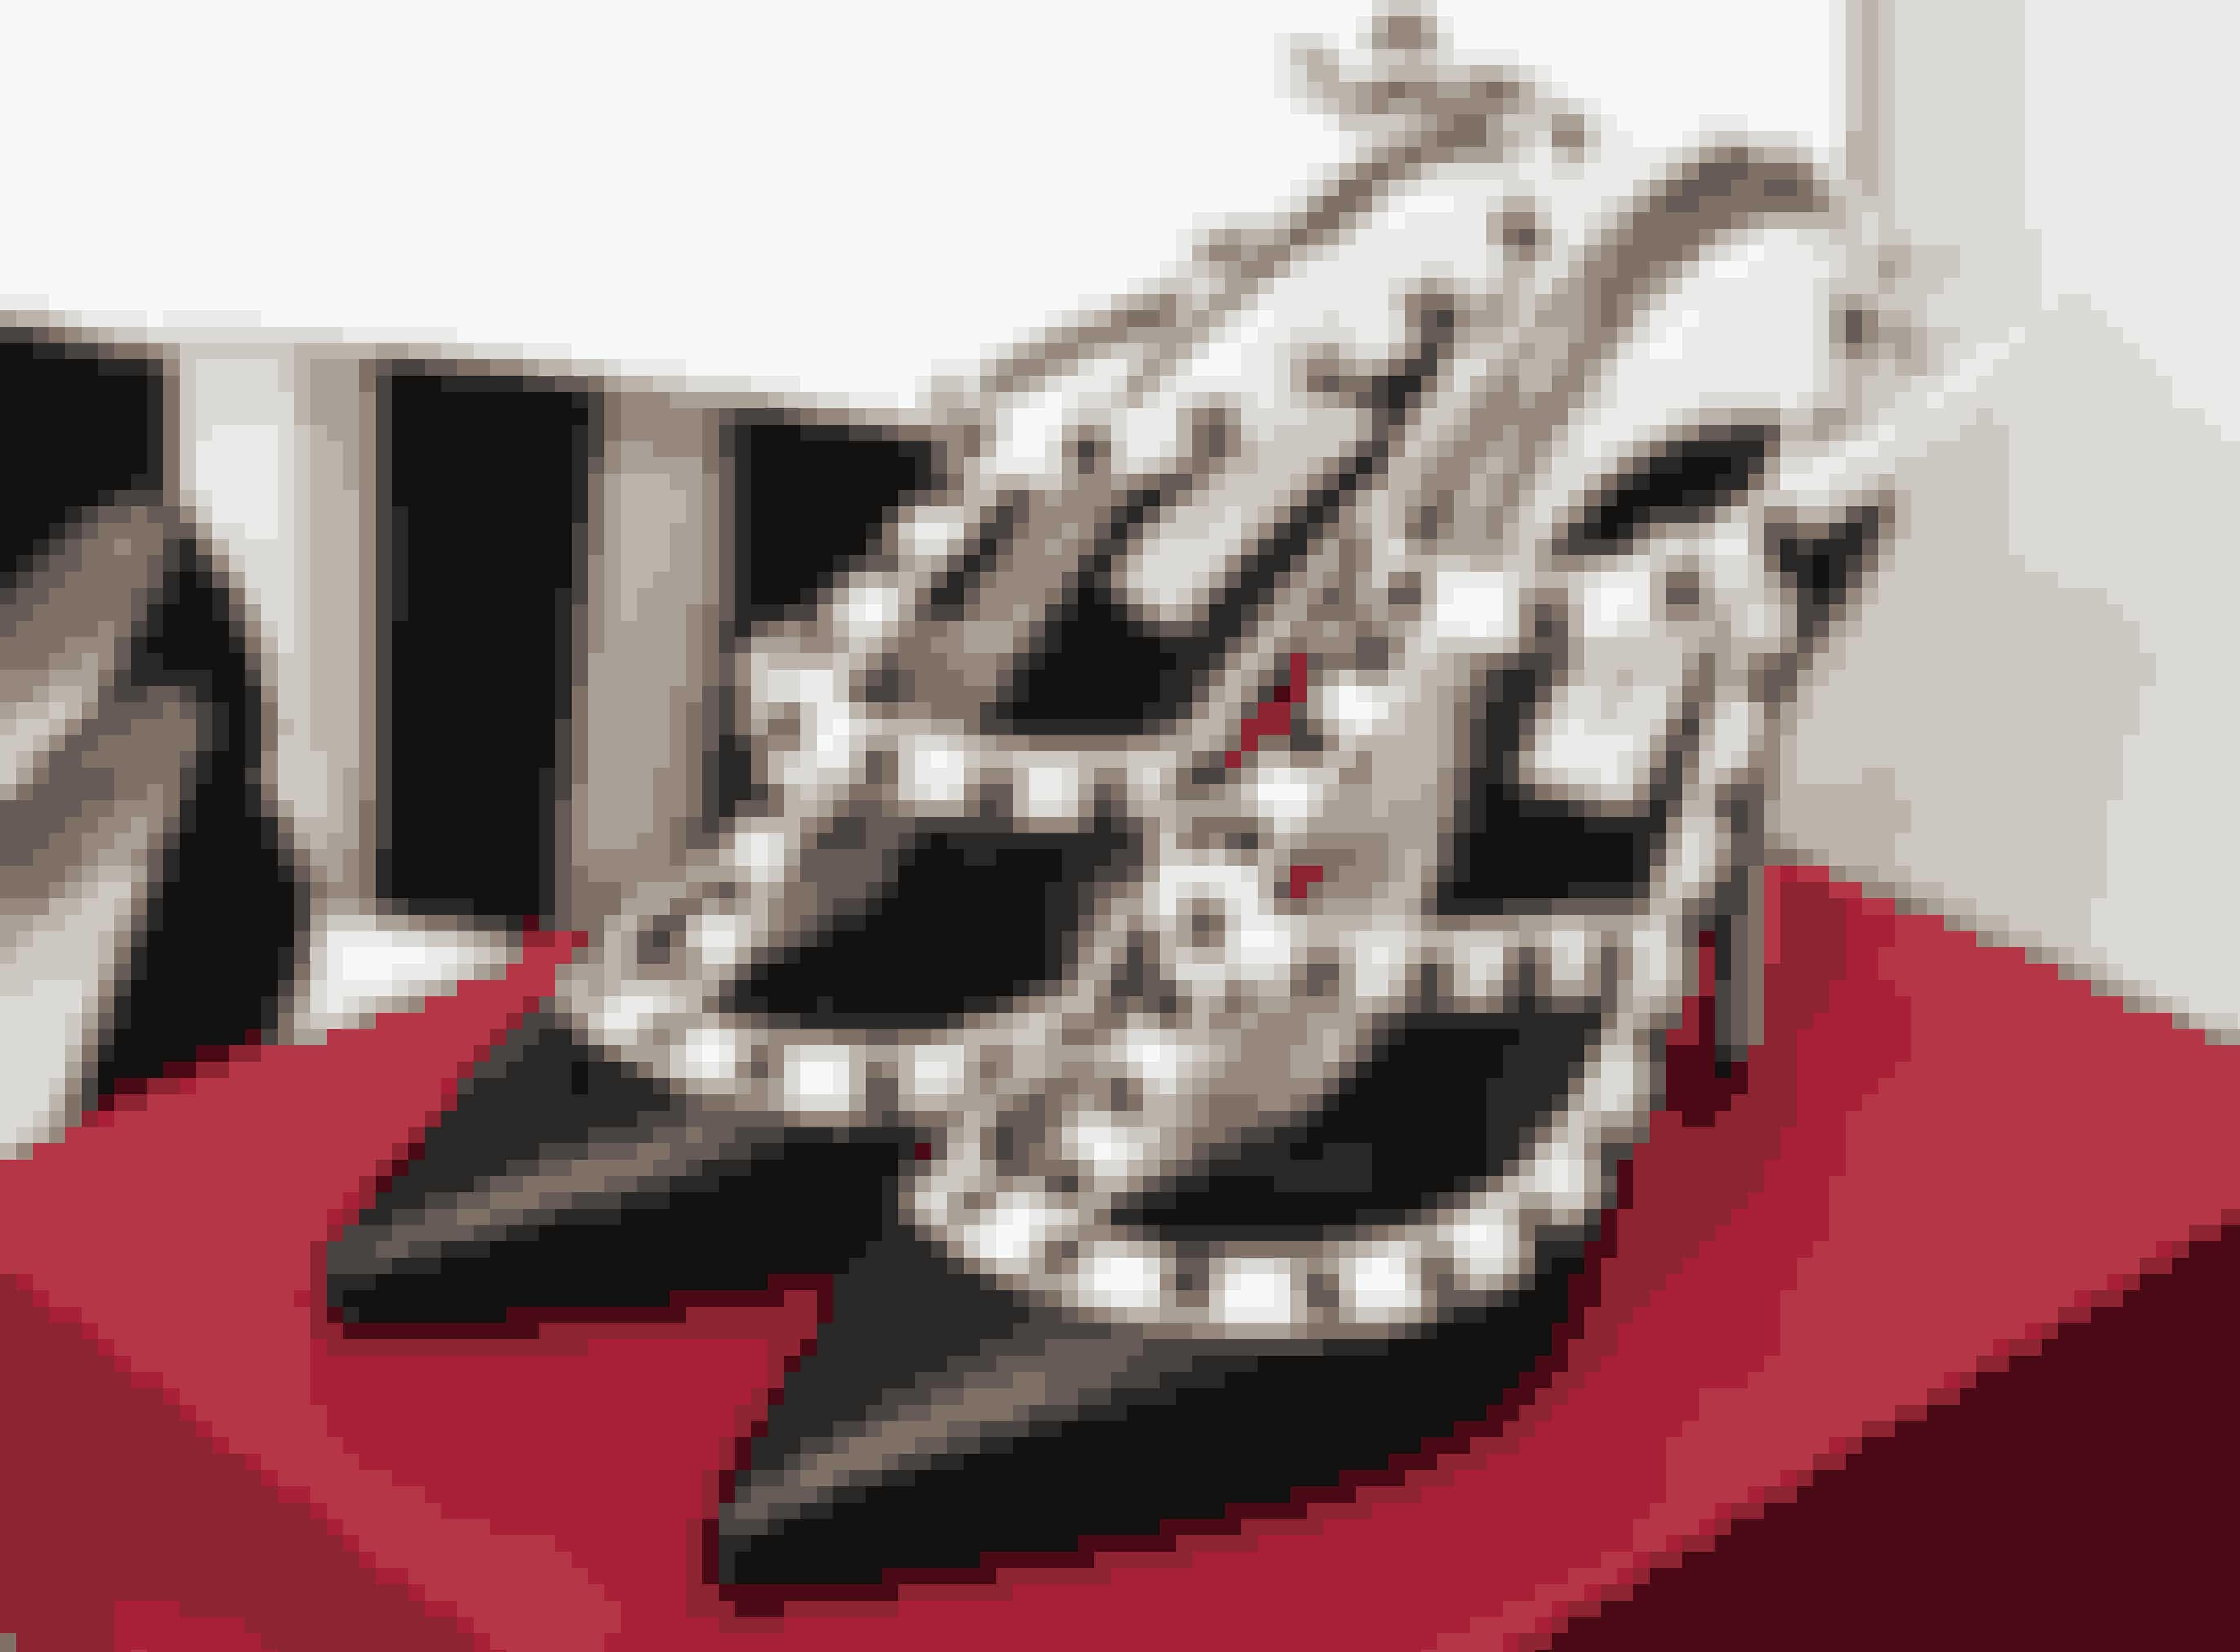 Valentino-skoene fik Kristina Græbe Sønderby af sin mand, da hun fyldte 40.